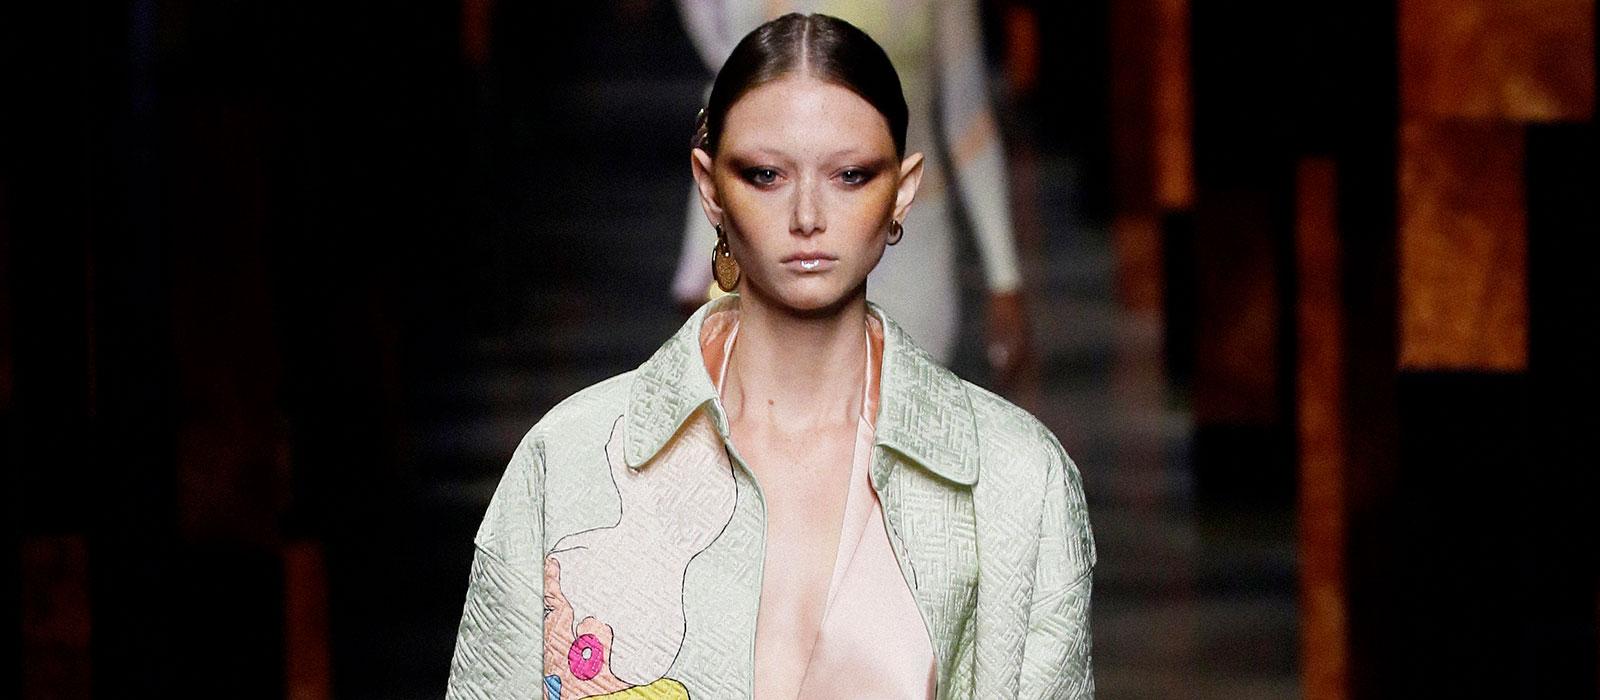 Fendi Spring Summer 2022 Collection